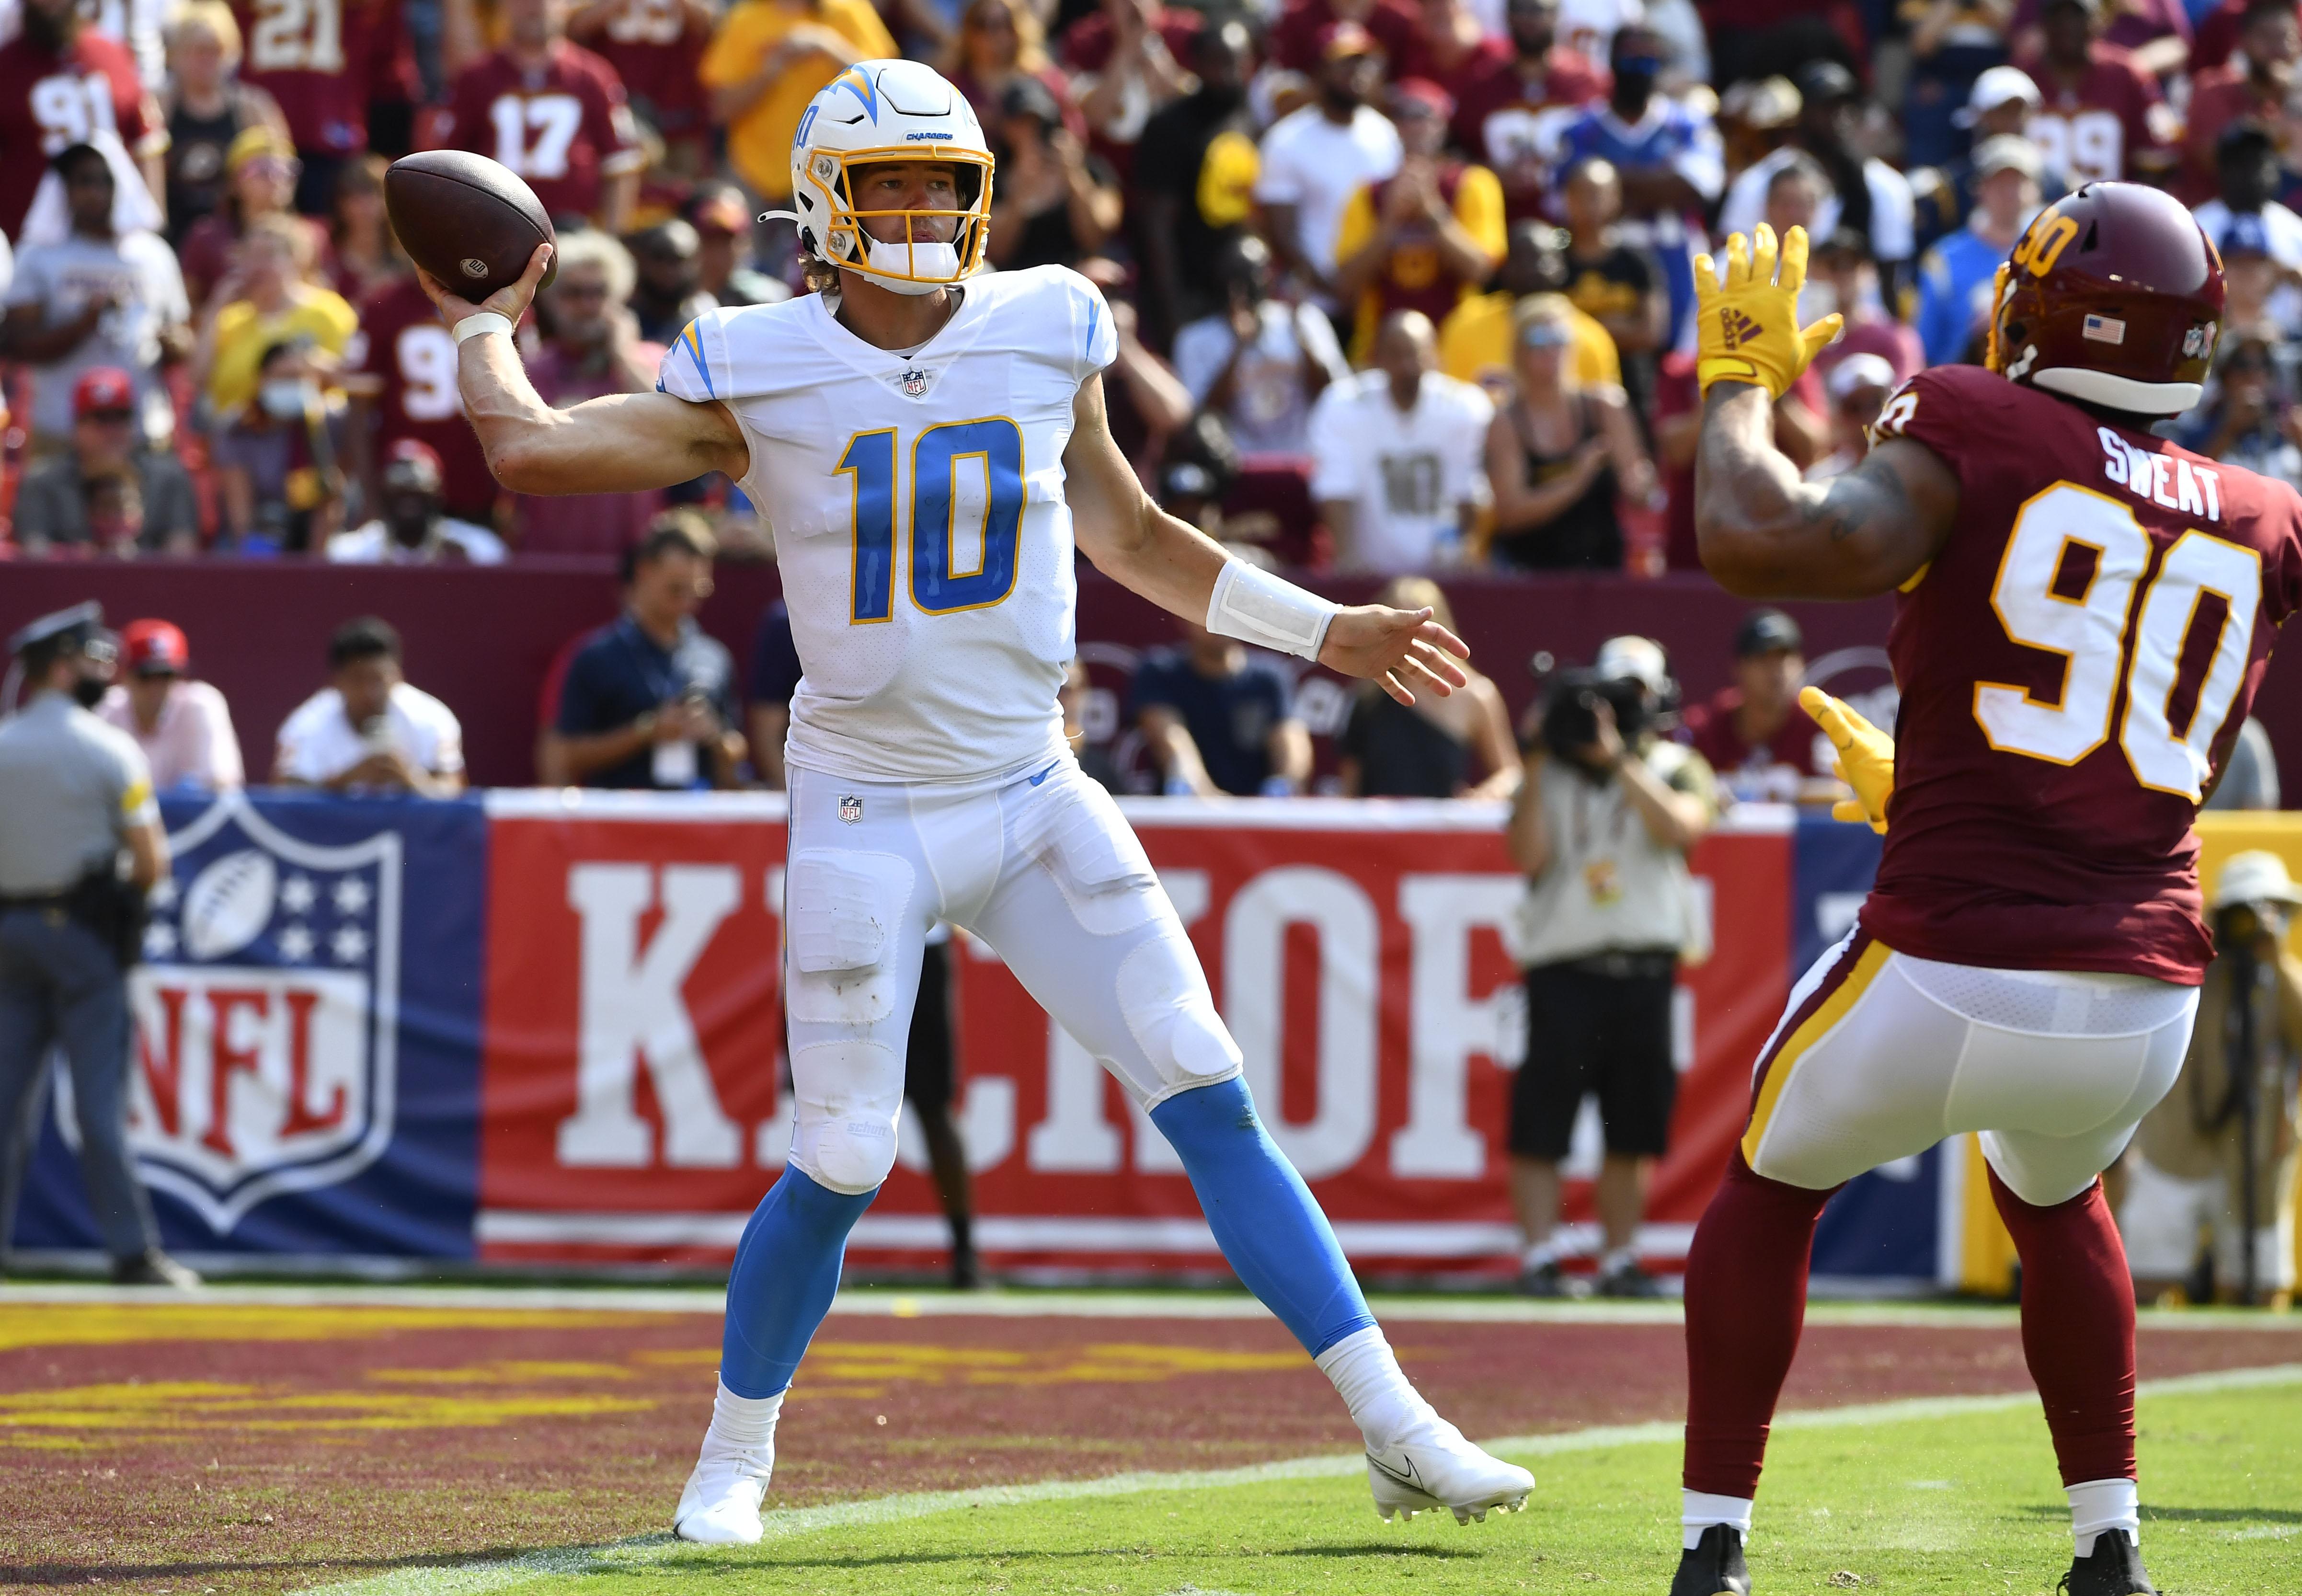 NFL: Los Angeles Chargers at Washington Football Team